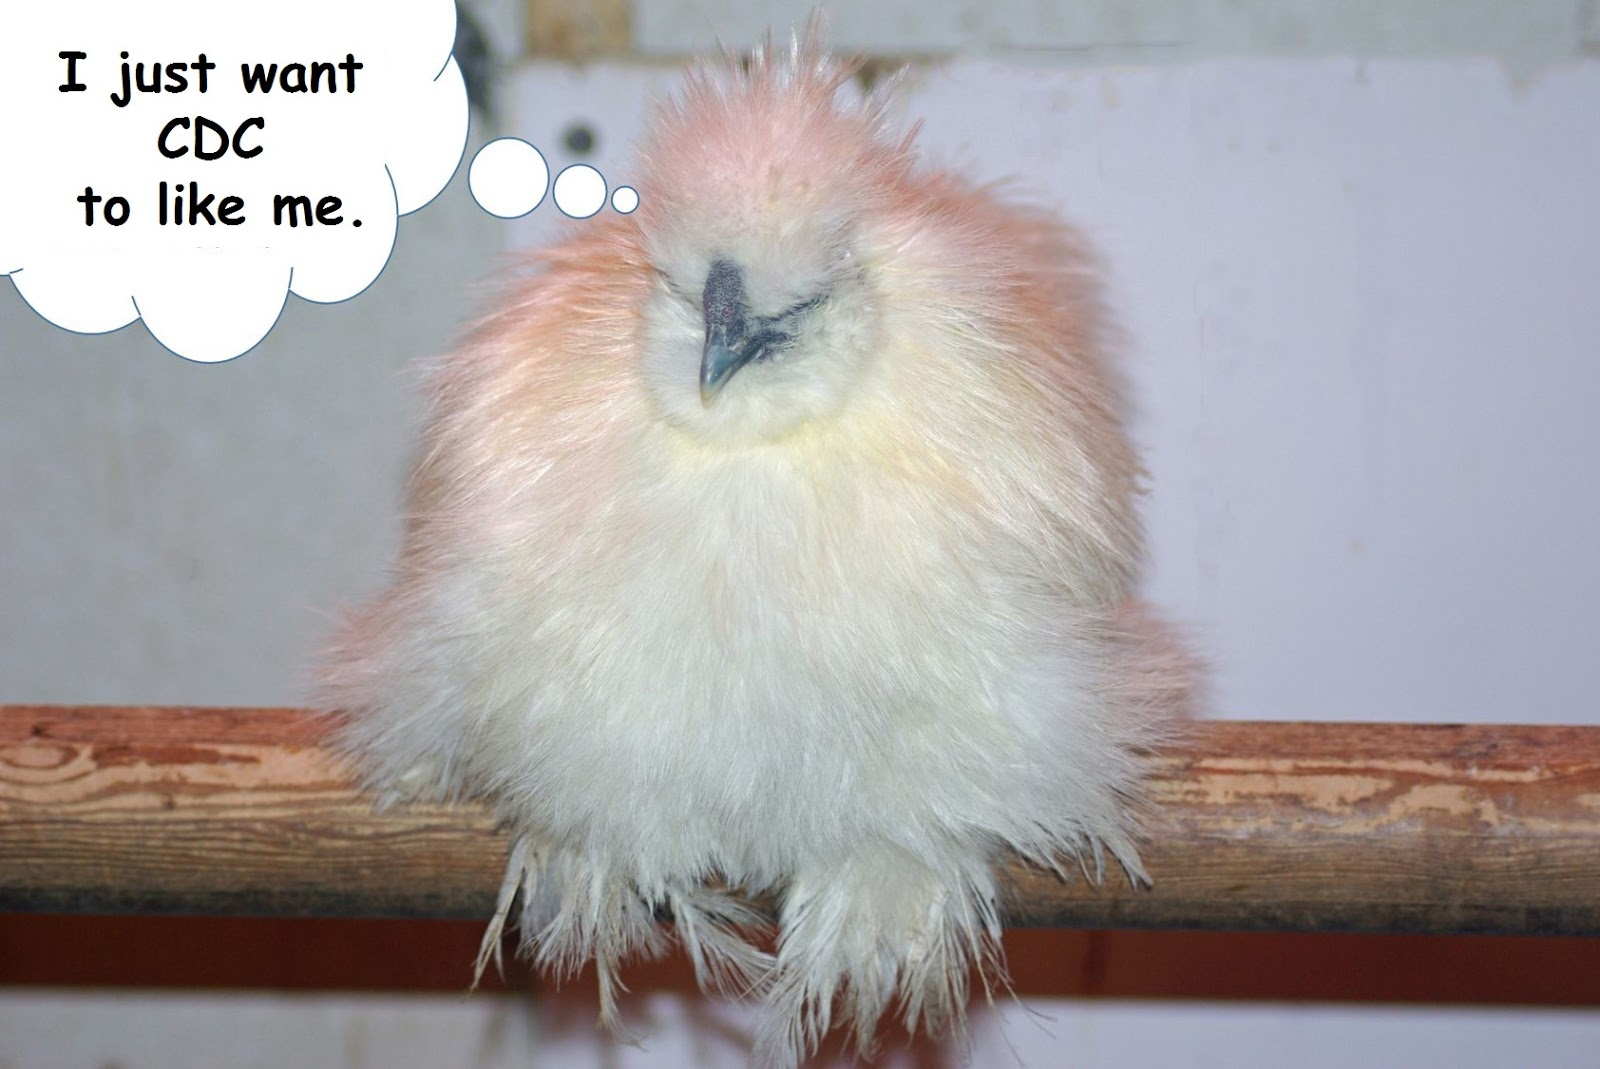 Backyard Chicken Blog randy's chicken blog: chicken kissing mentioned here!!!